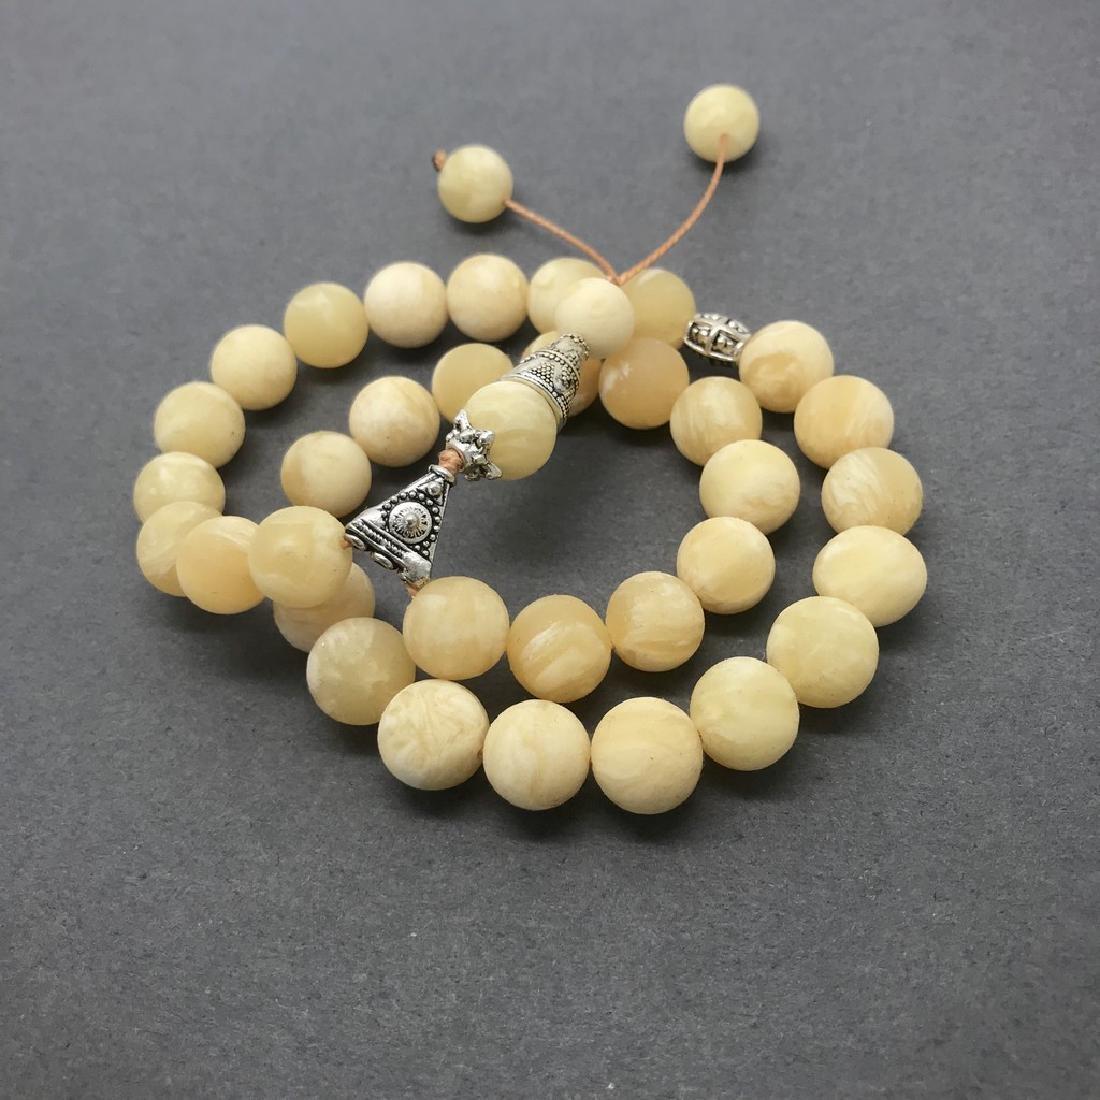 Misbaha tesbih Baltic amber white 33 beads ø10mm 24 - 3